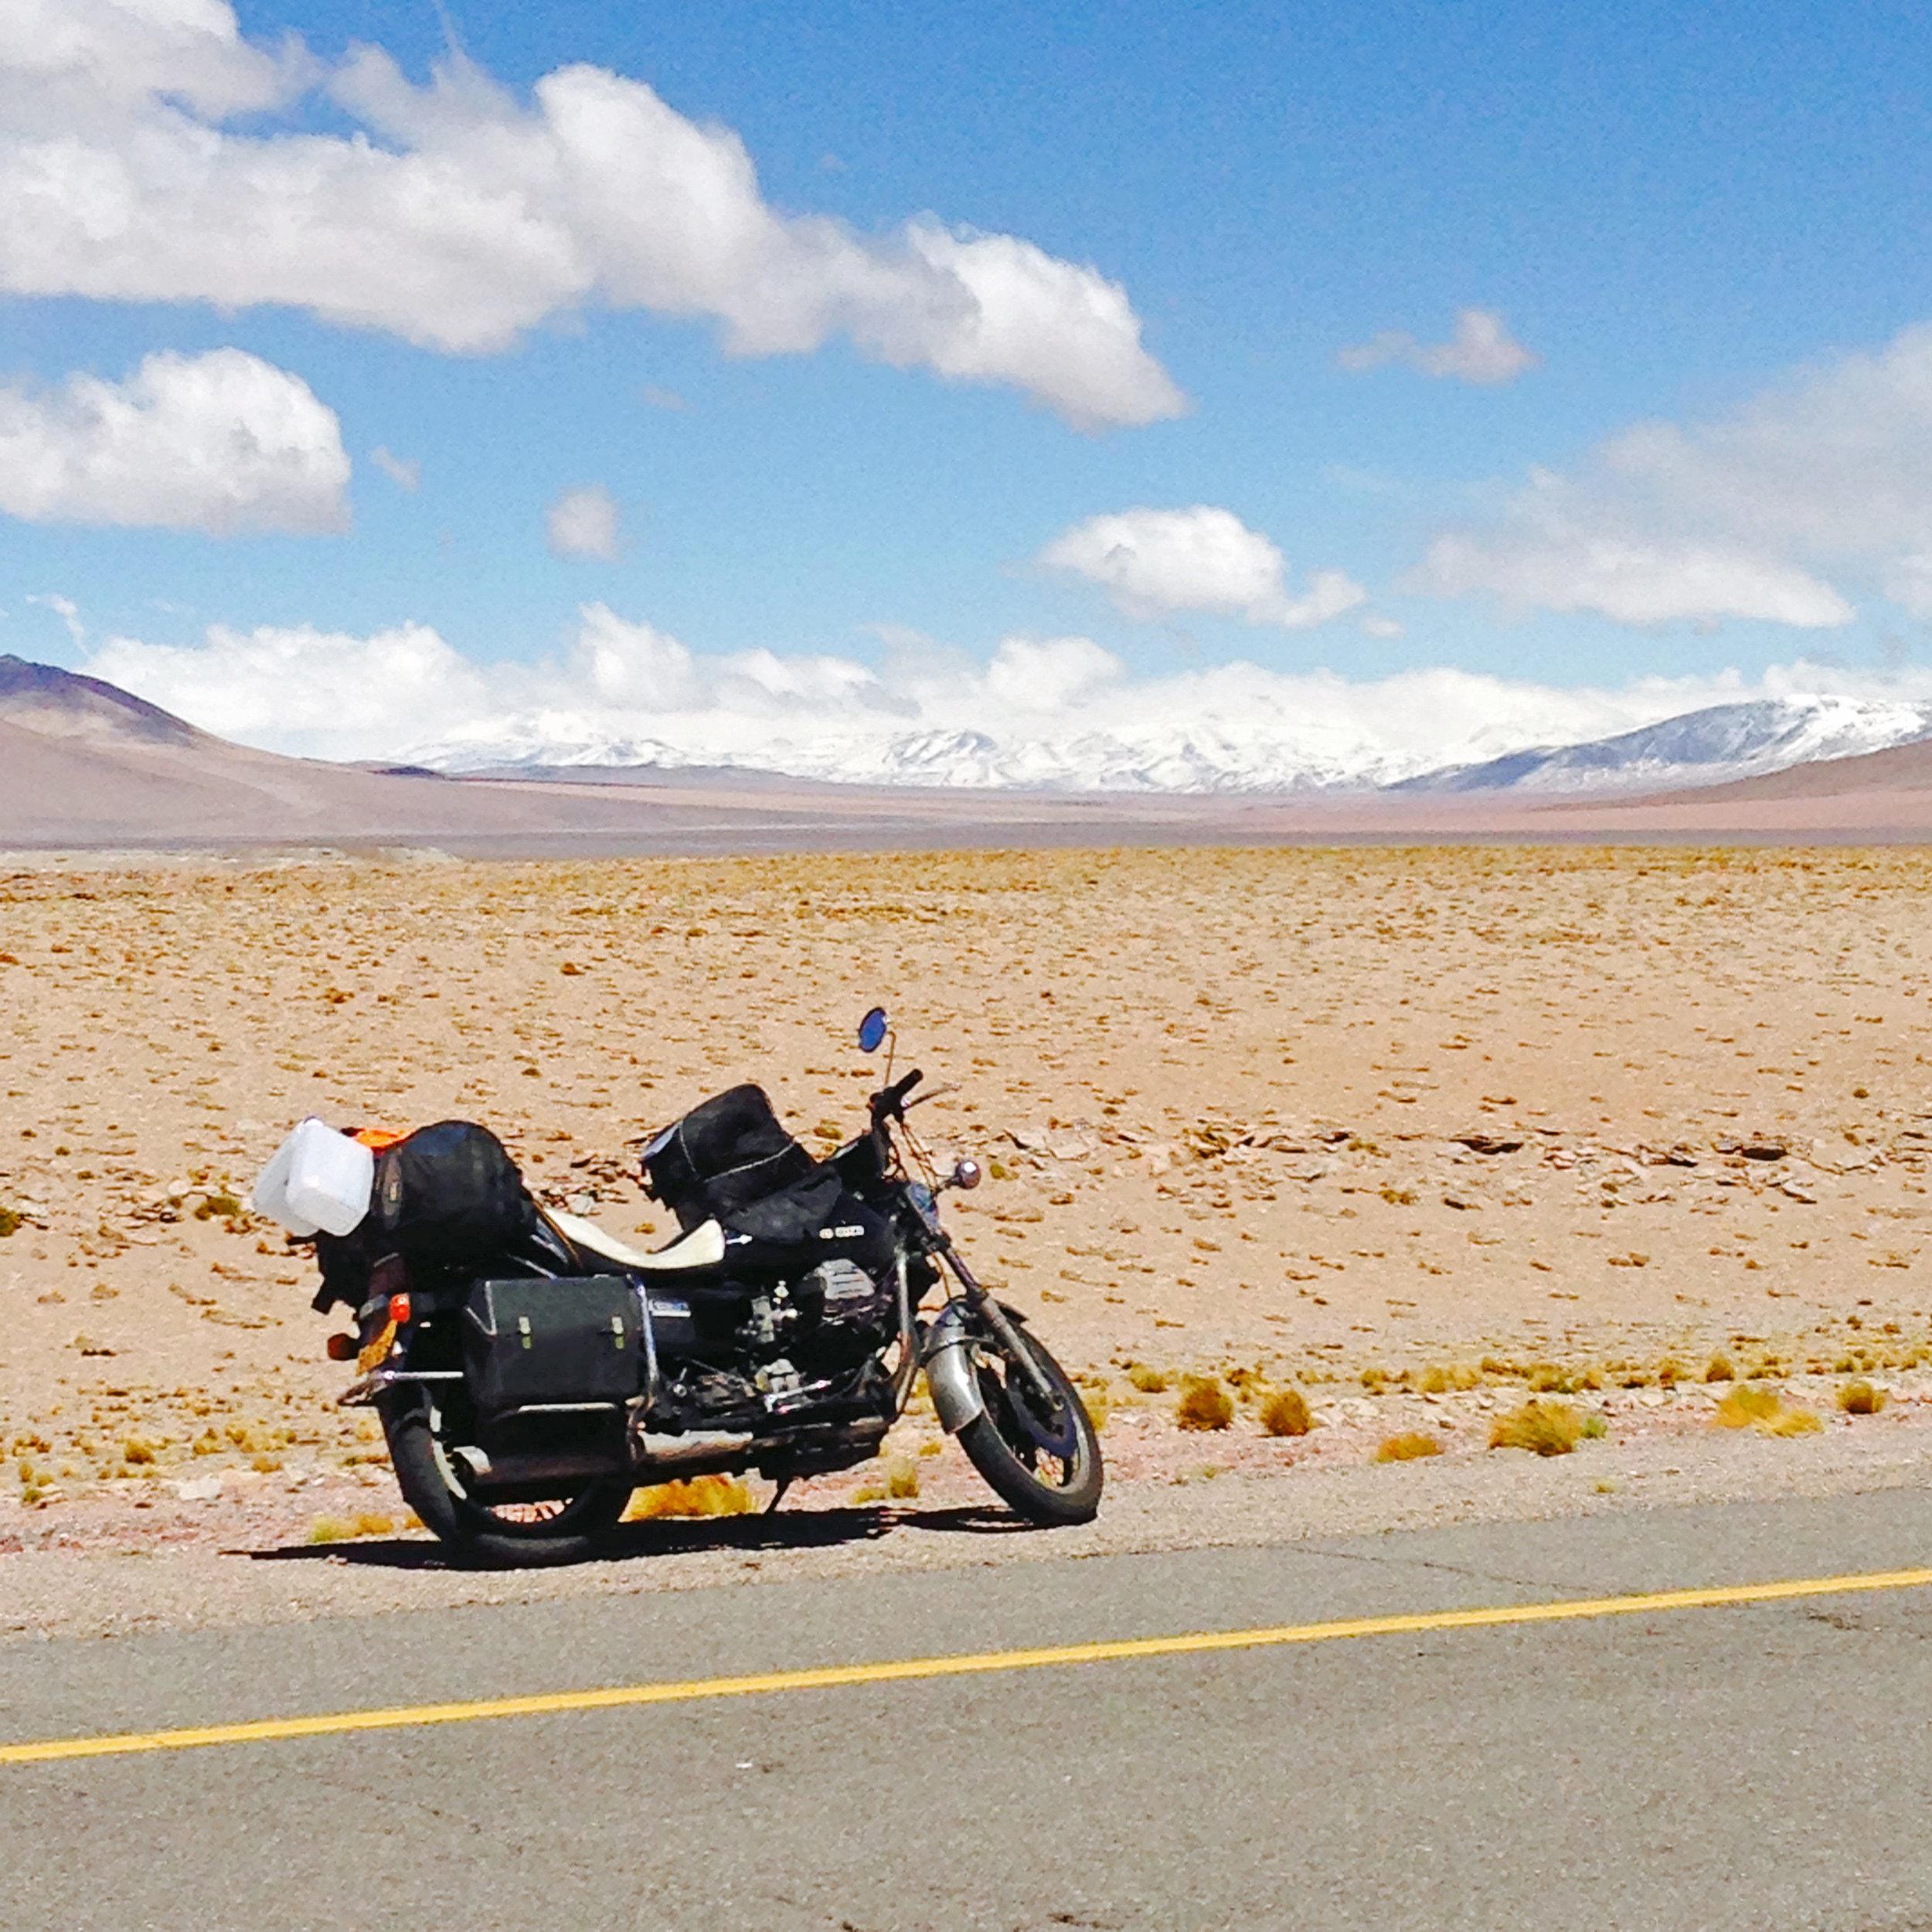 Paso de Jama, border pass between Argentina and Chile